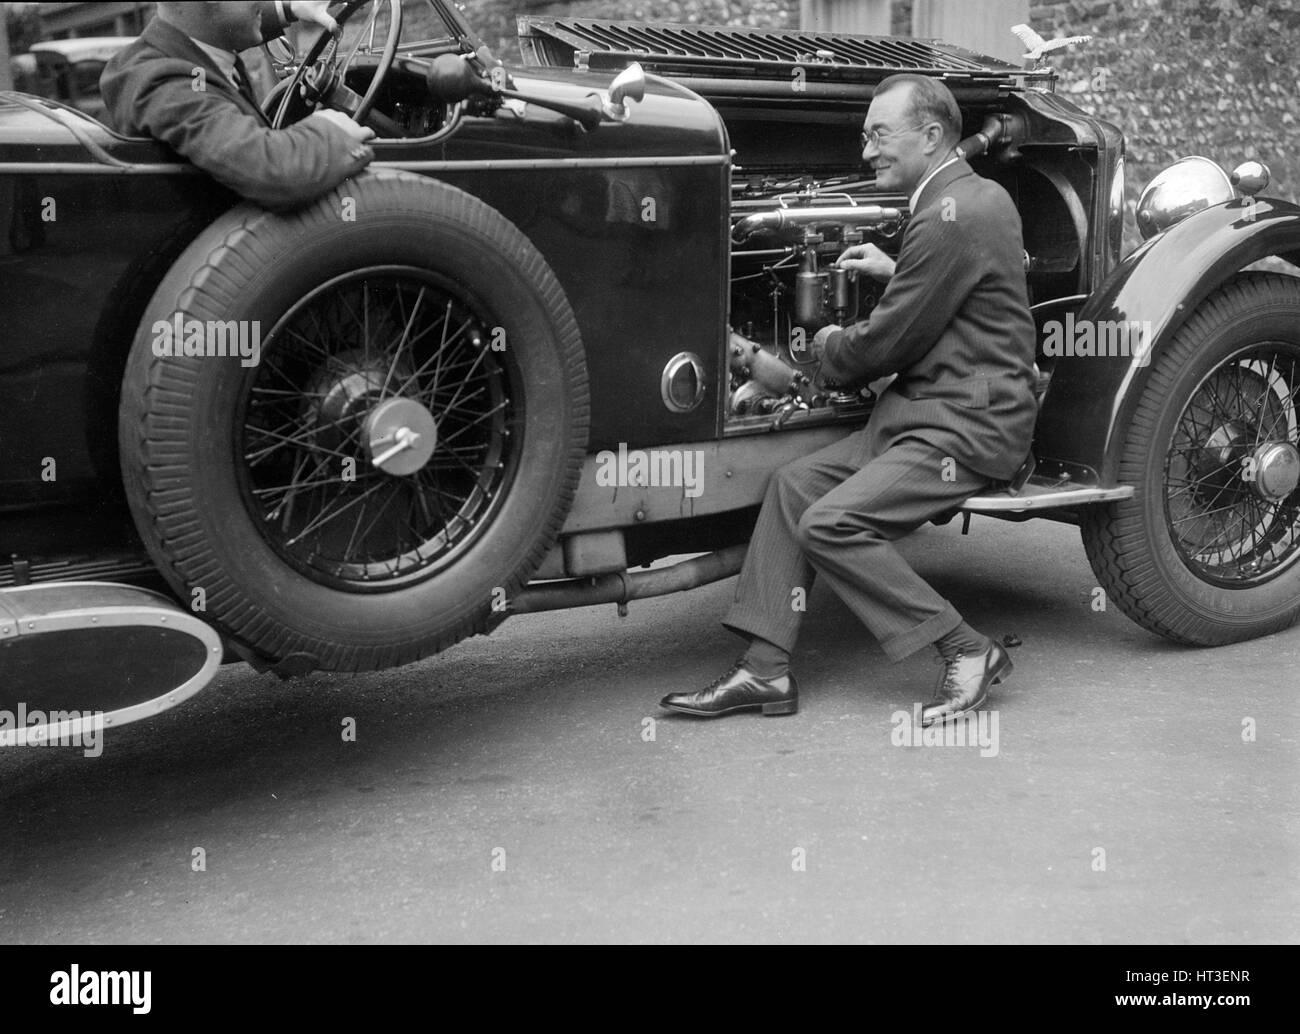 Geoffrey Baker inspecting the engine of a Minerva car. Artist: Bill Brunell. - Stock Image